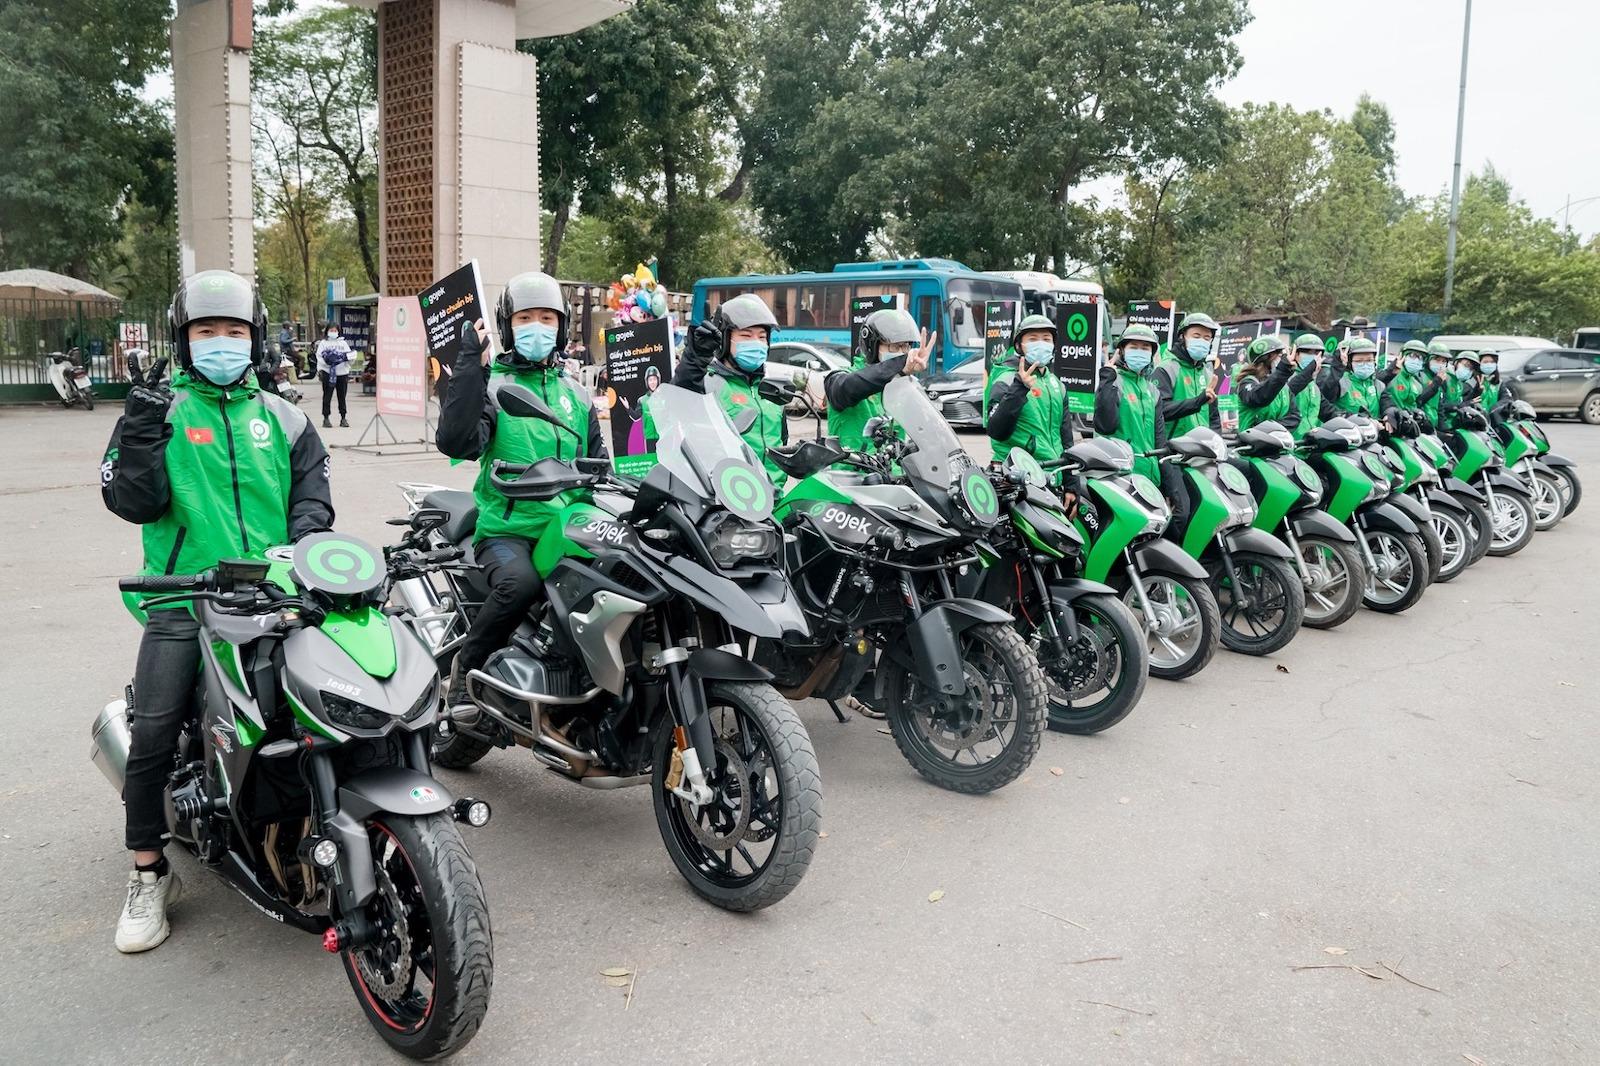 Image of Gojek motorbikes in a line